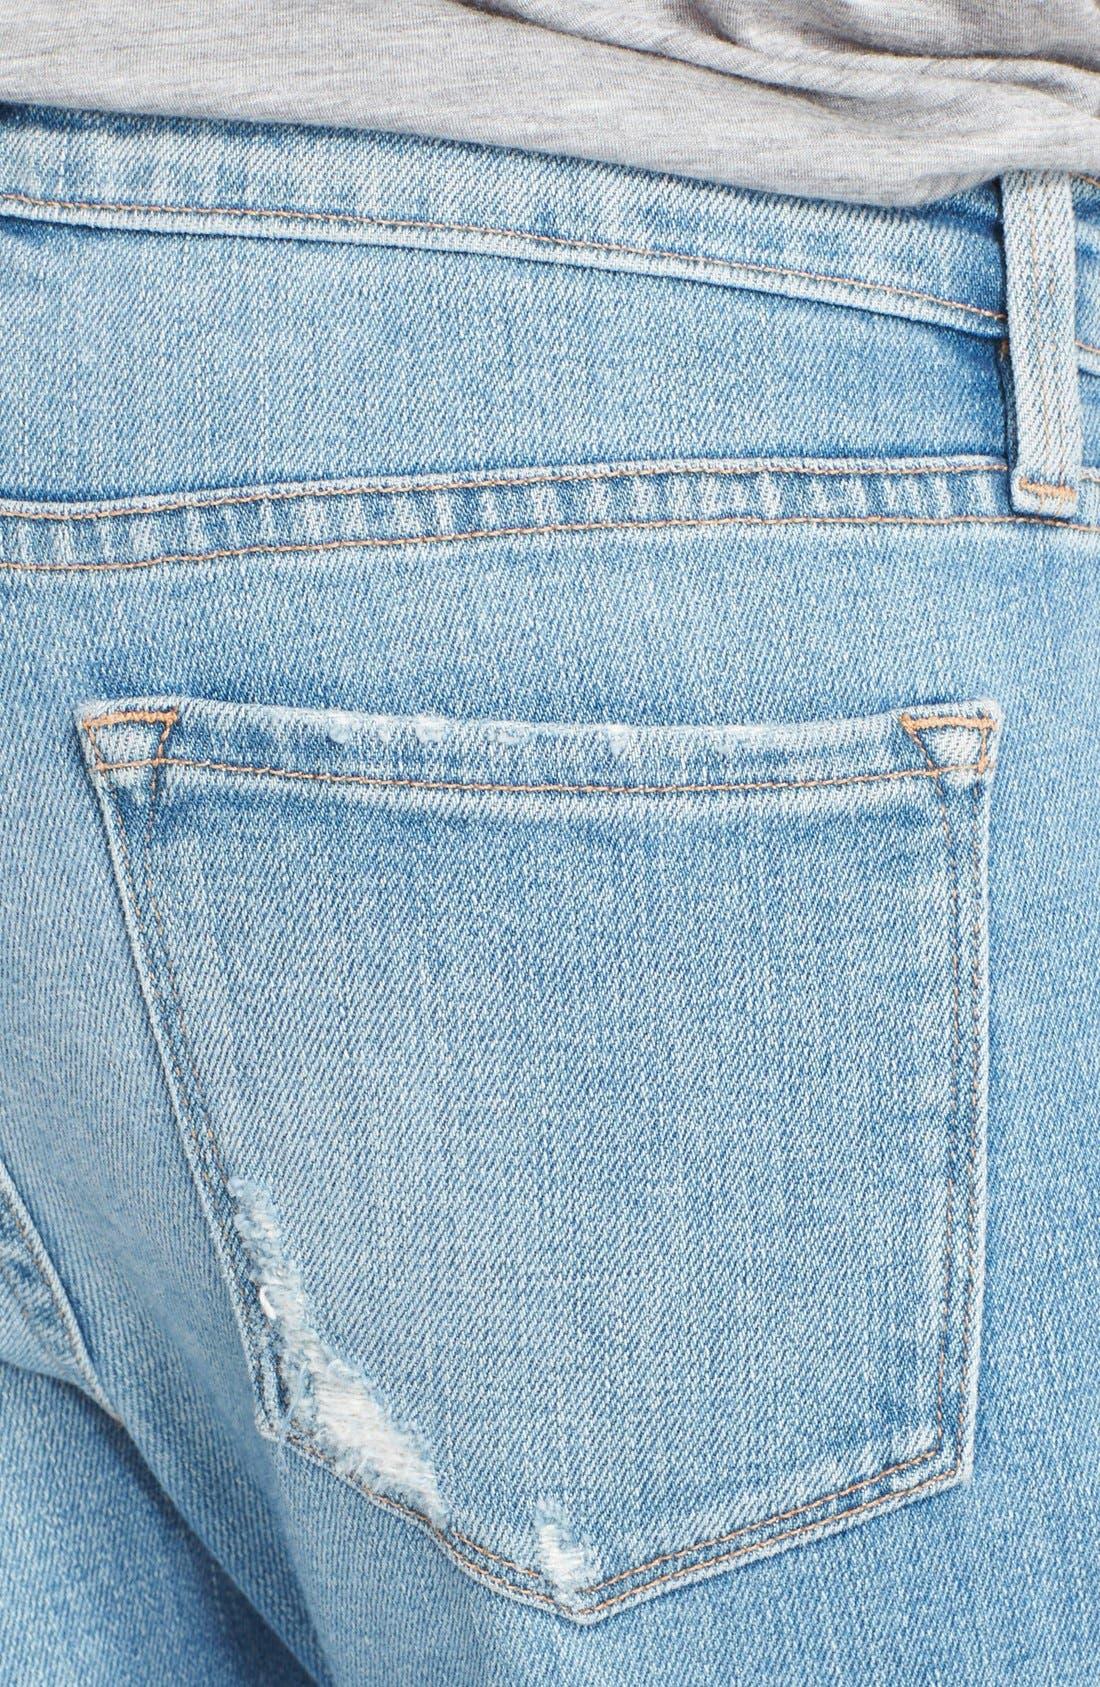 Alternate Image 3  - Frame Denim 'Le Garcon' Boyfriend Jeans (Beek Street)